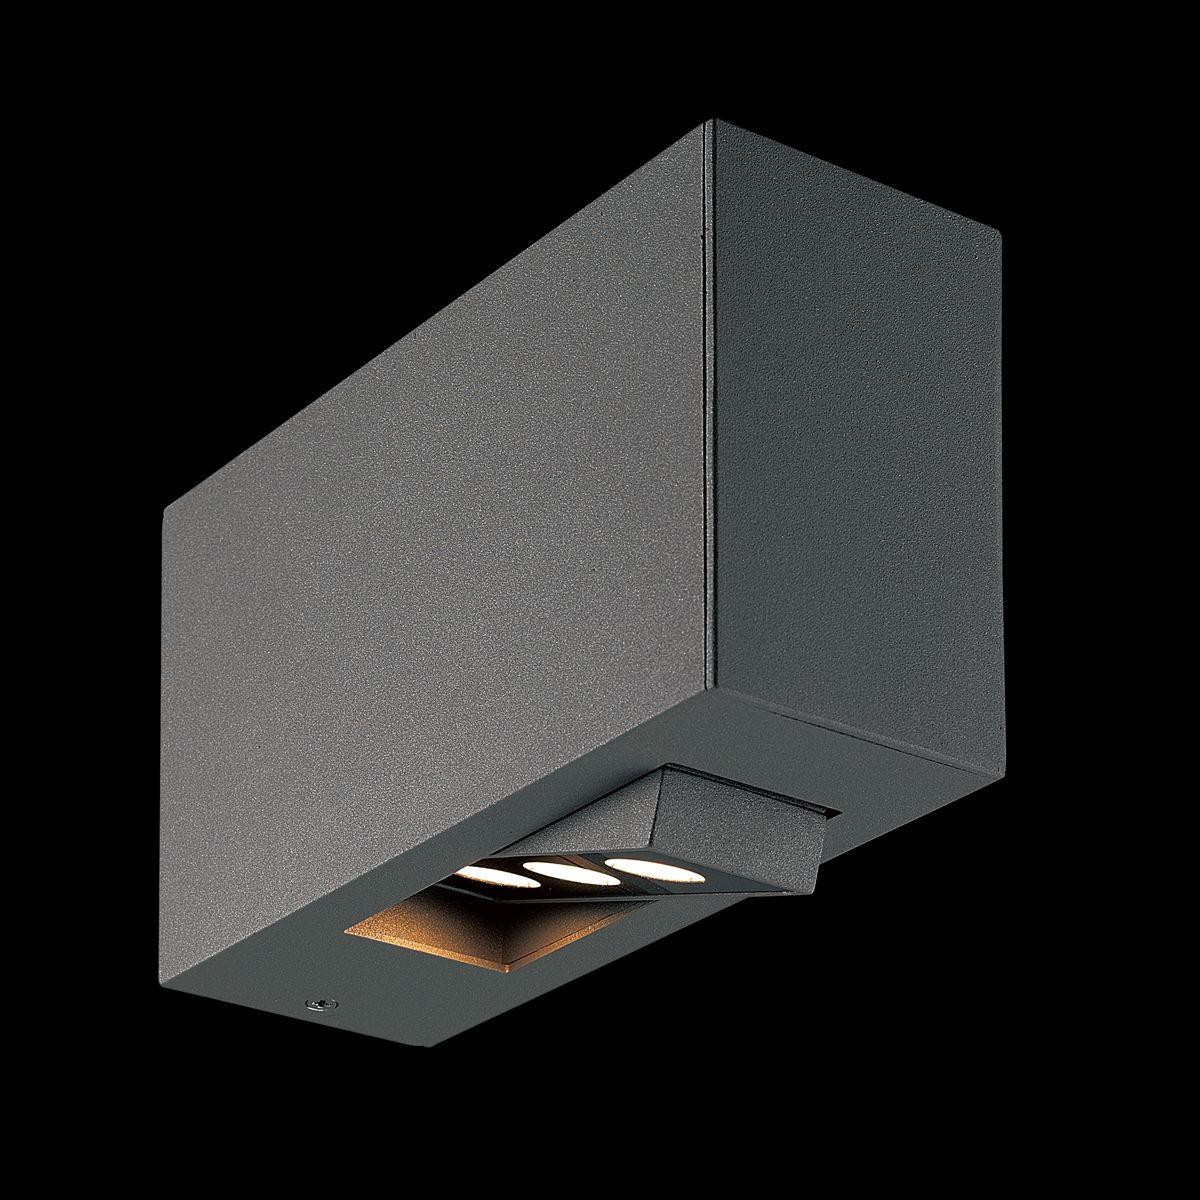 Eurofase Lighting Products Oscar 28280 026